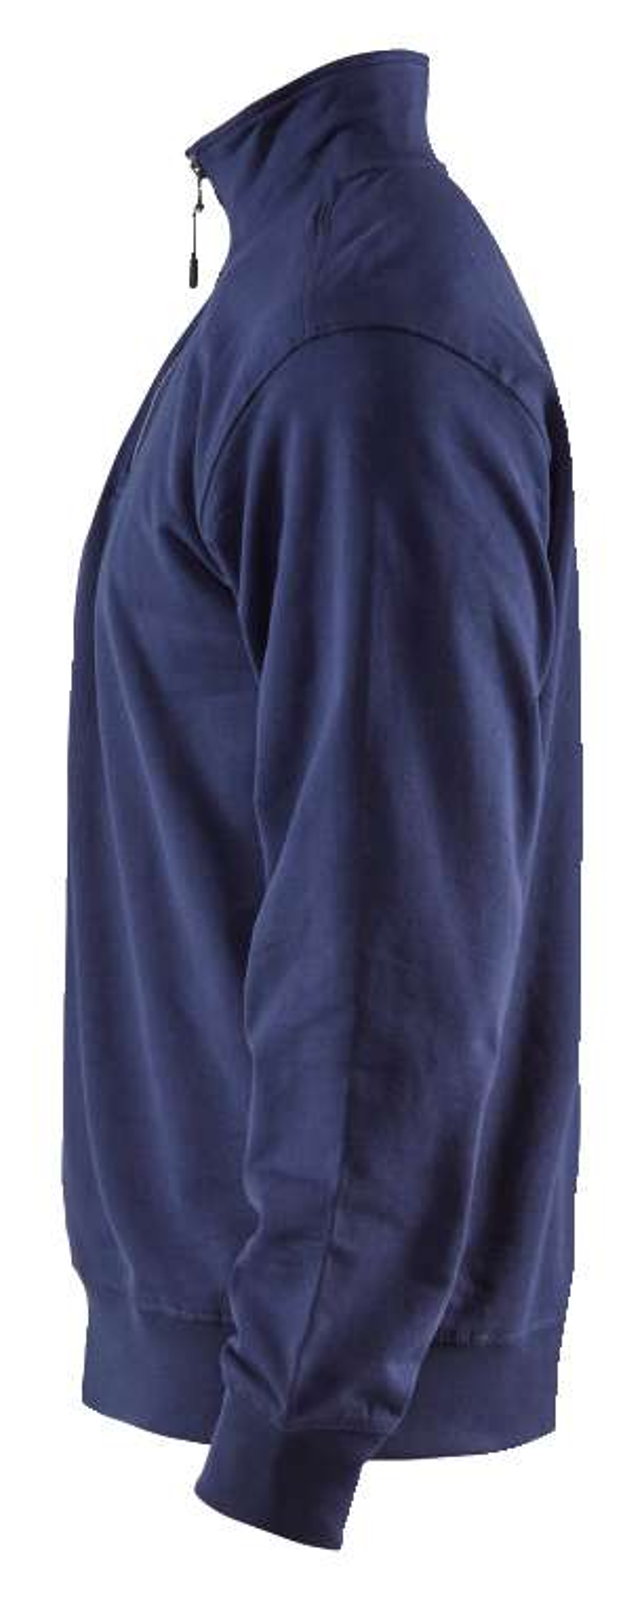 Blaklader Sweatshirts 33691158 marineblauw(8600)